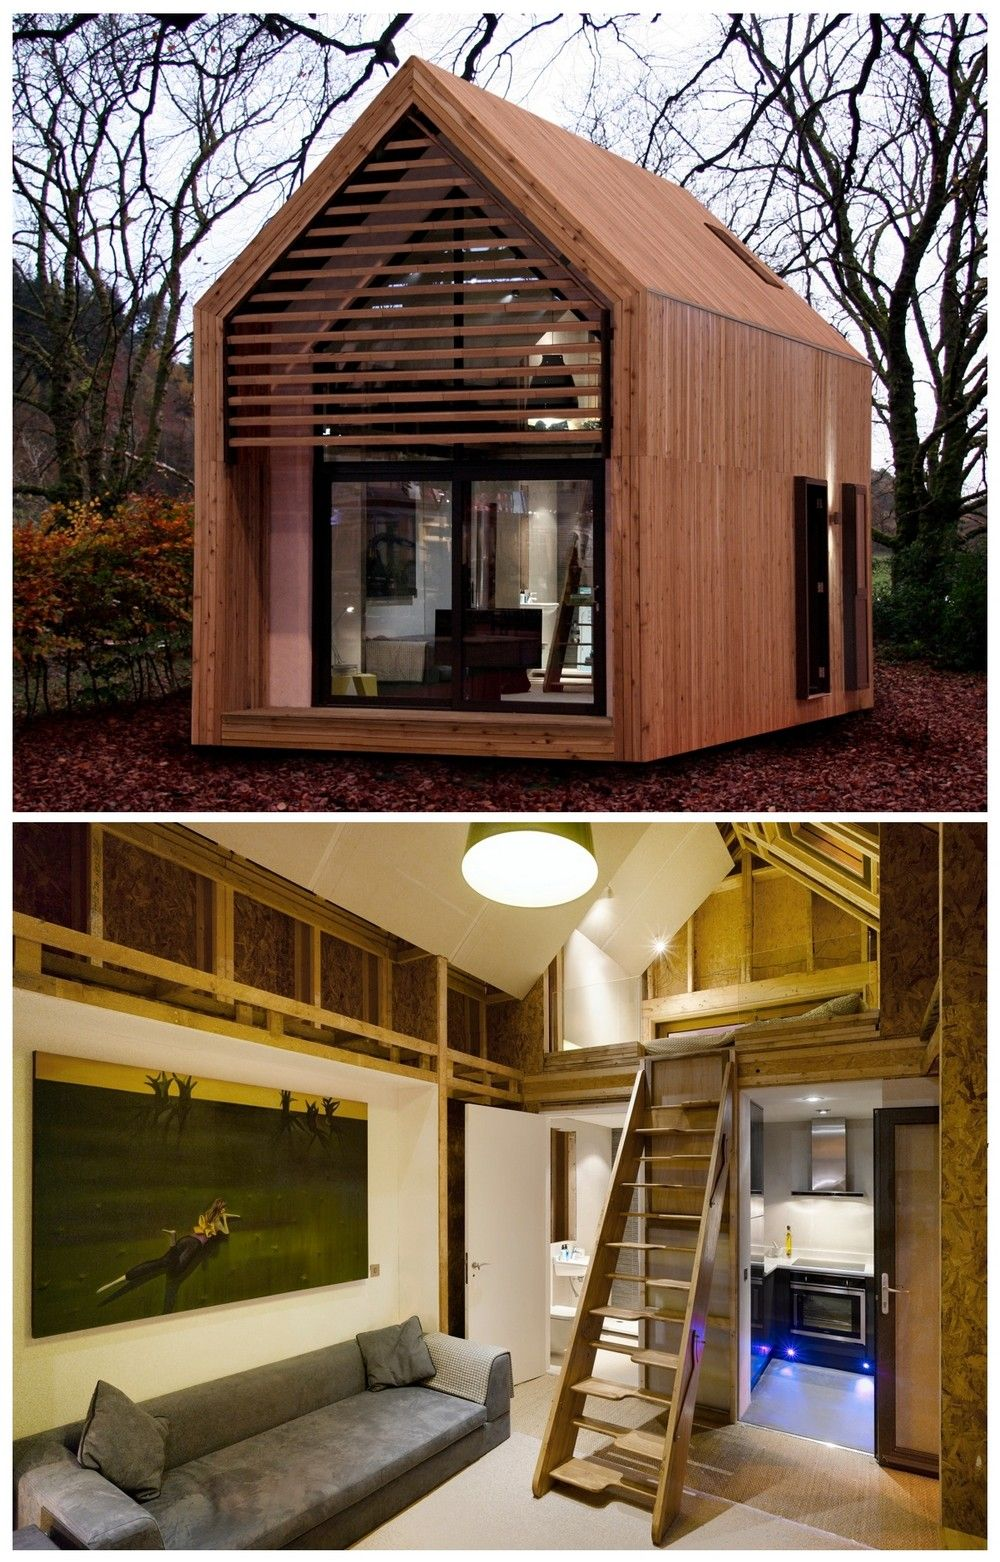 Dwelle, Minimalist House Prefabs. Modern tiny house